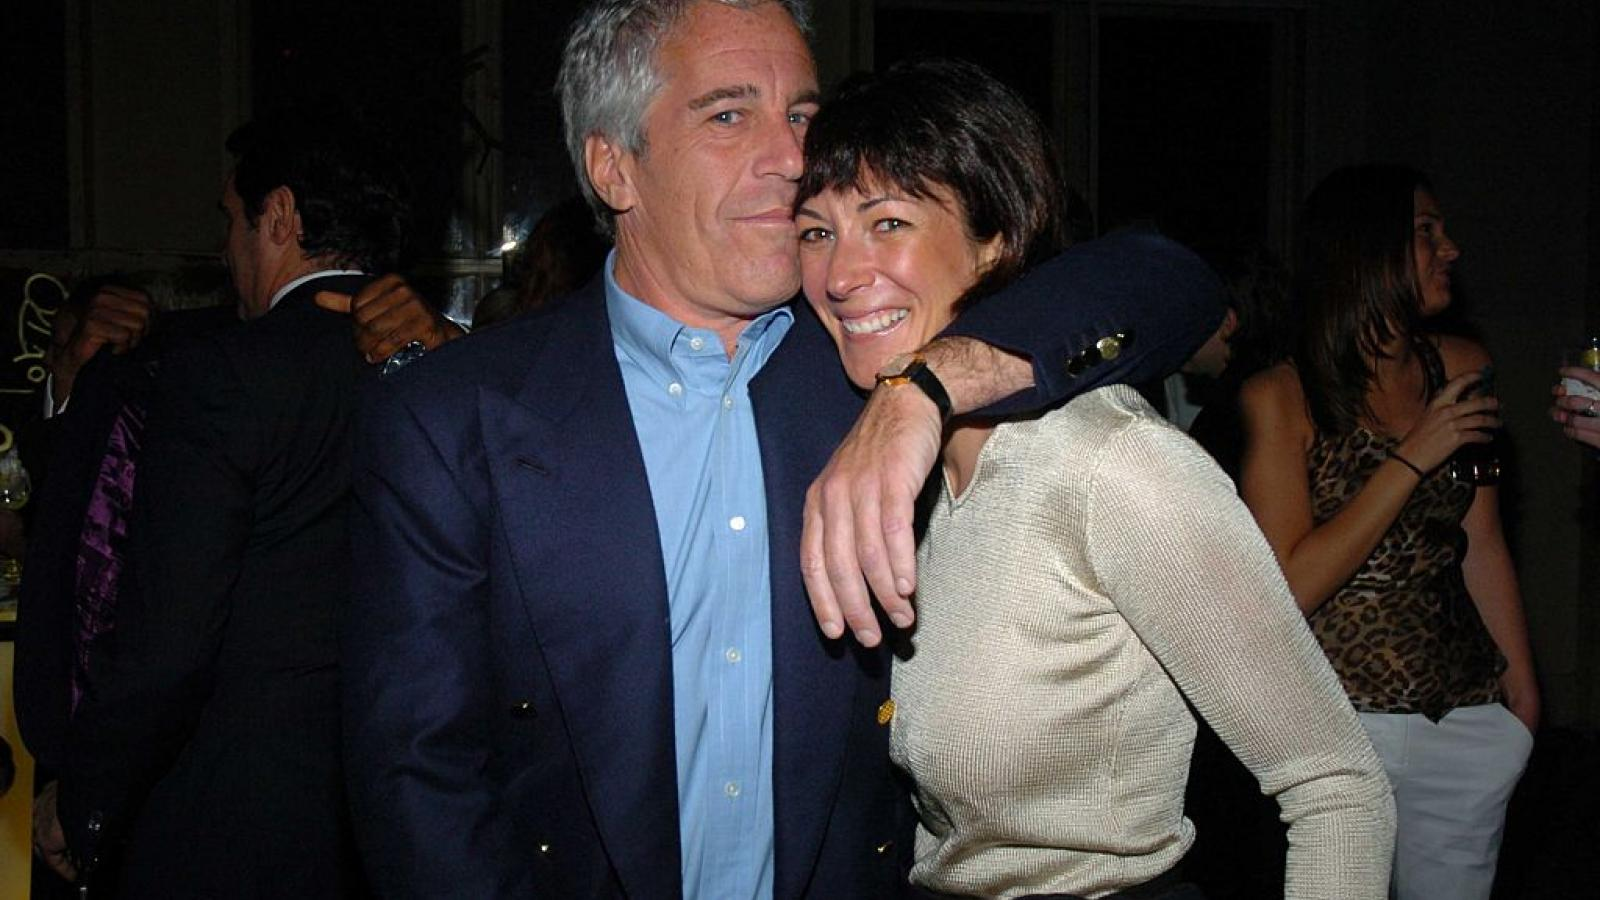 Jeffrey Epstein and Ghislaine Maxwell in 2005